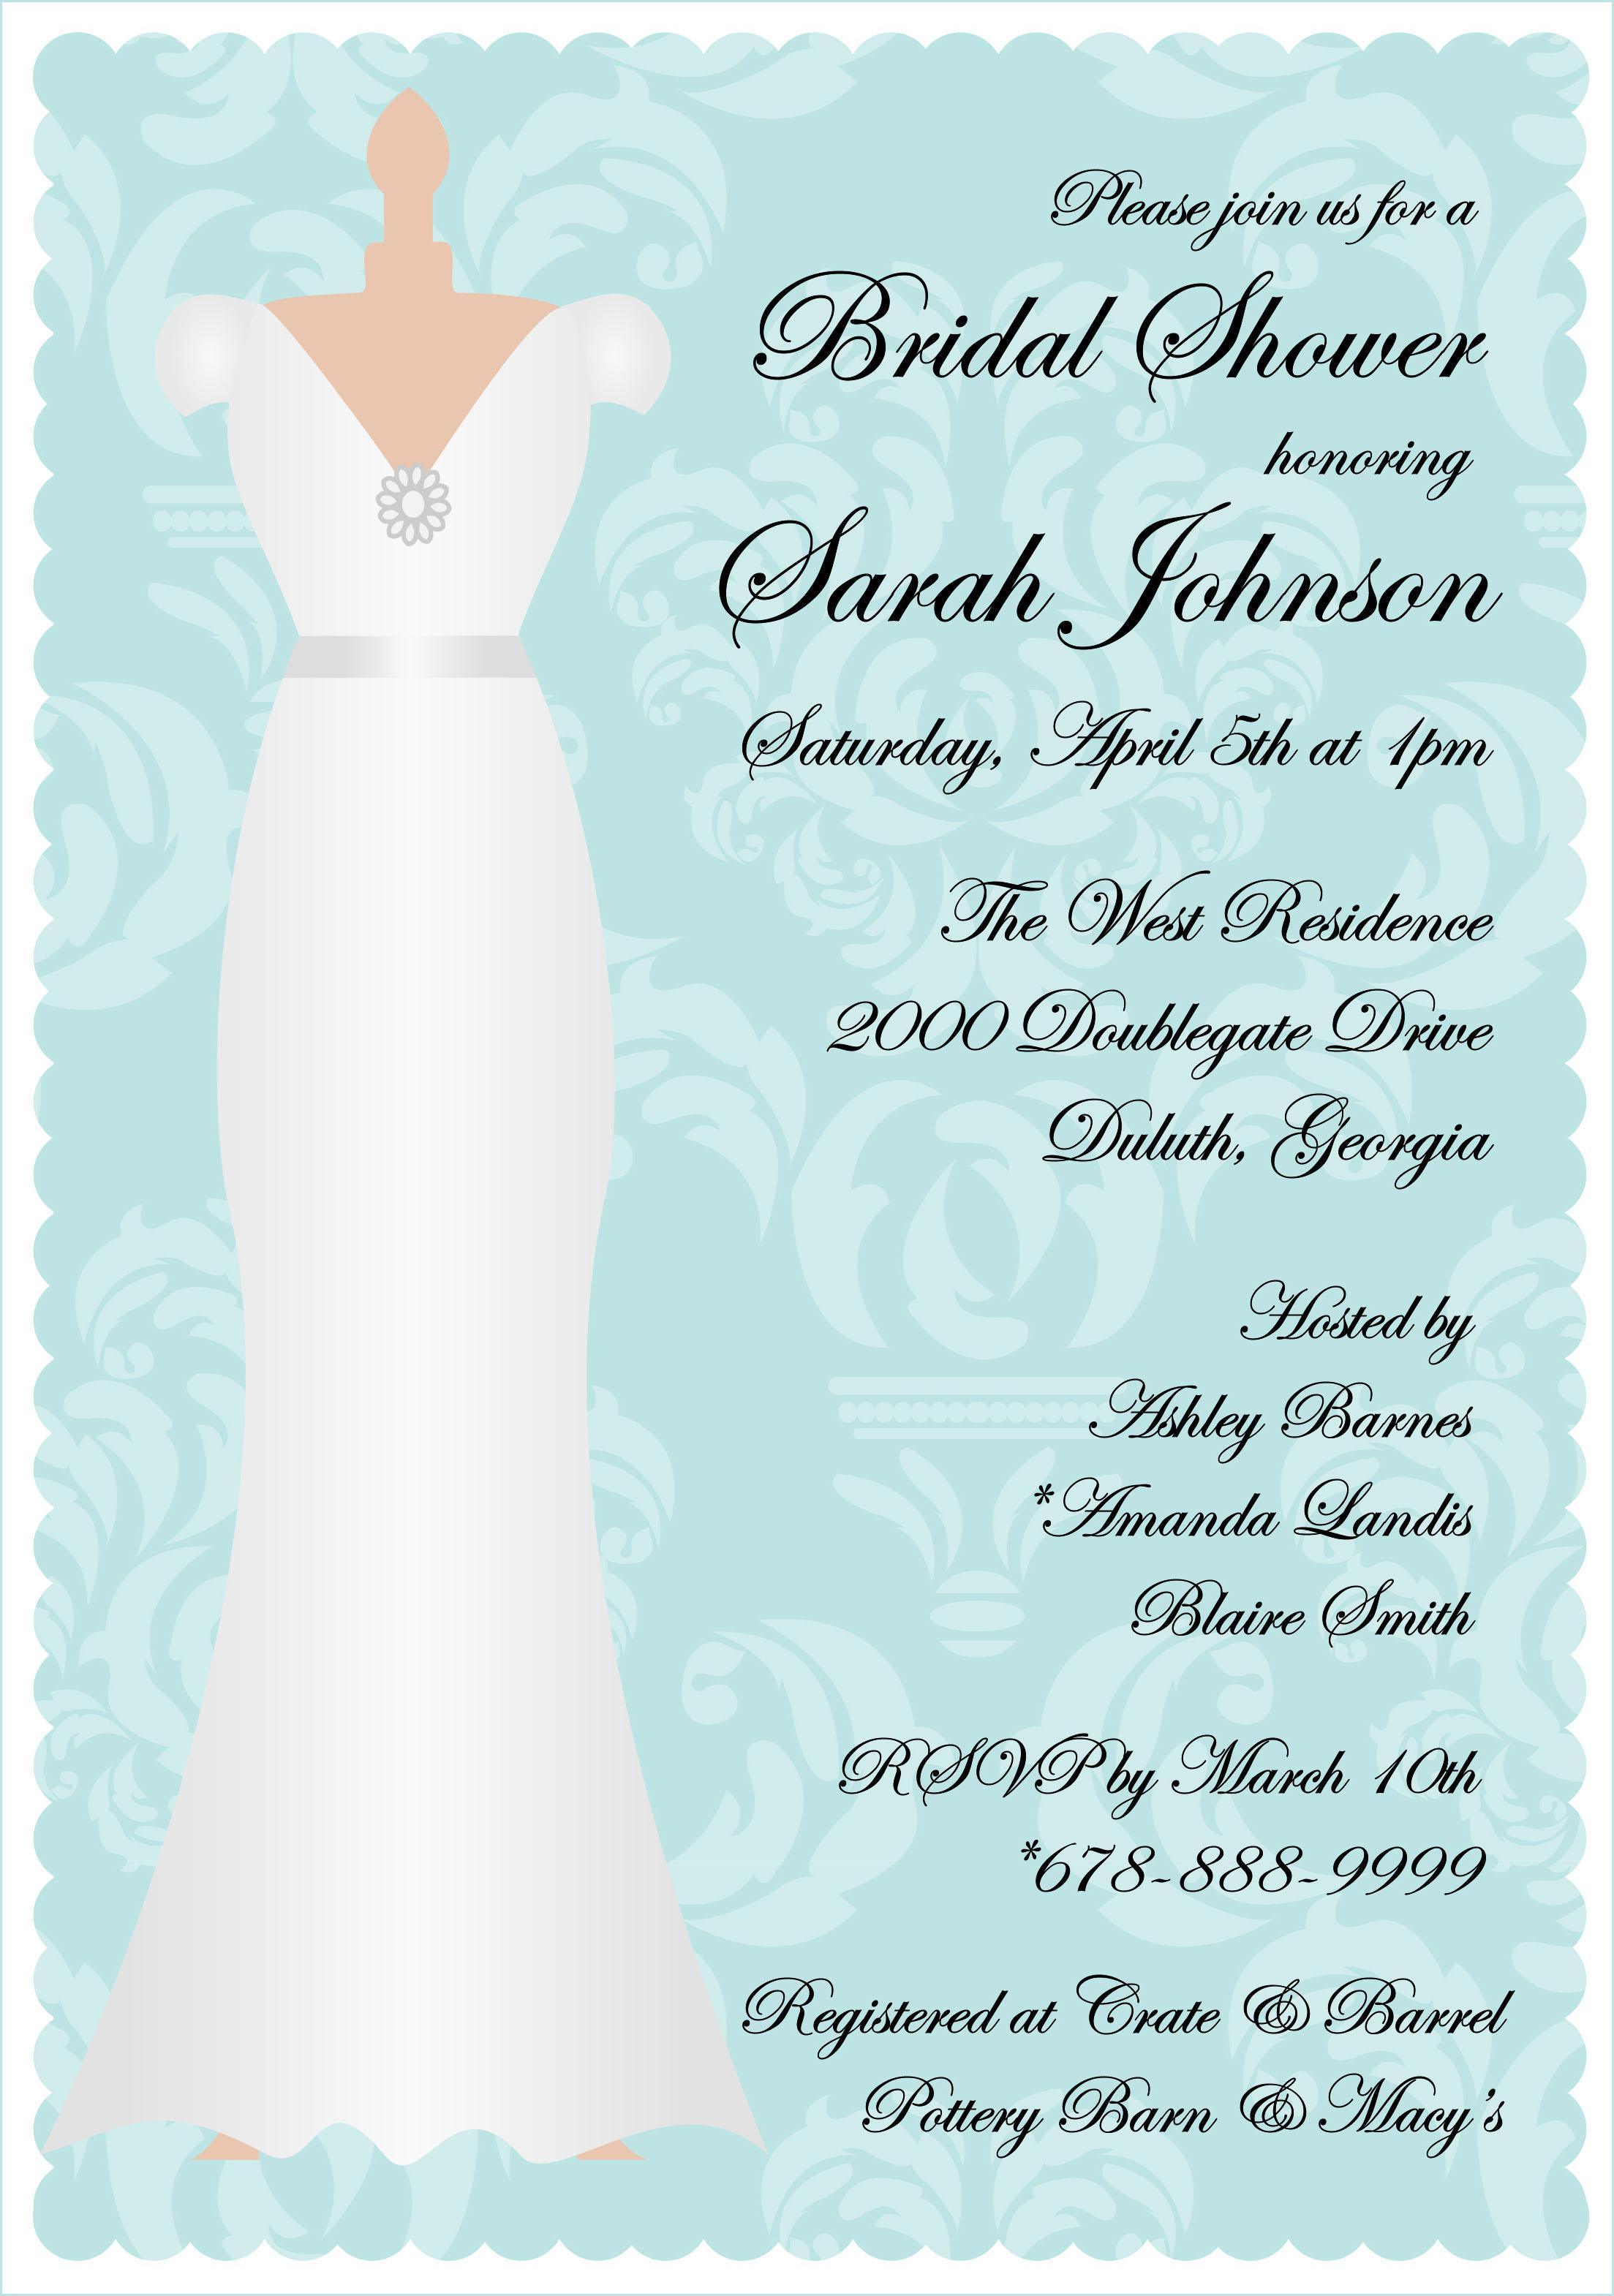 Wedding Shower - Pure Design Graphics